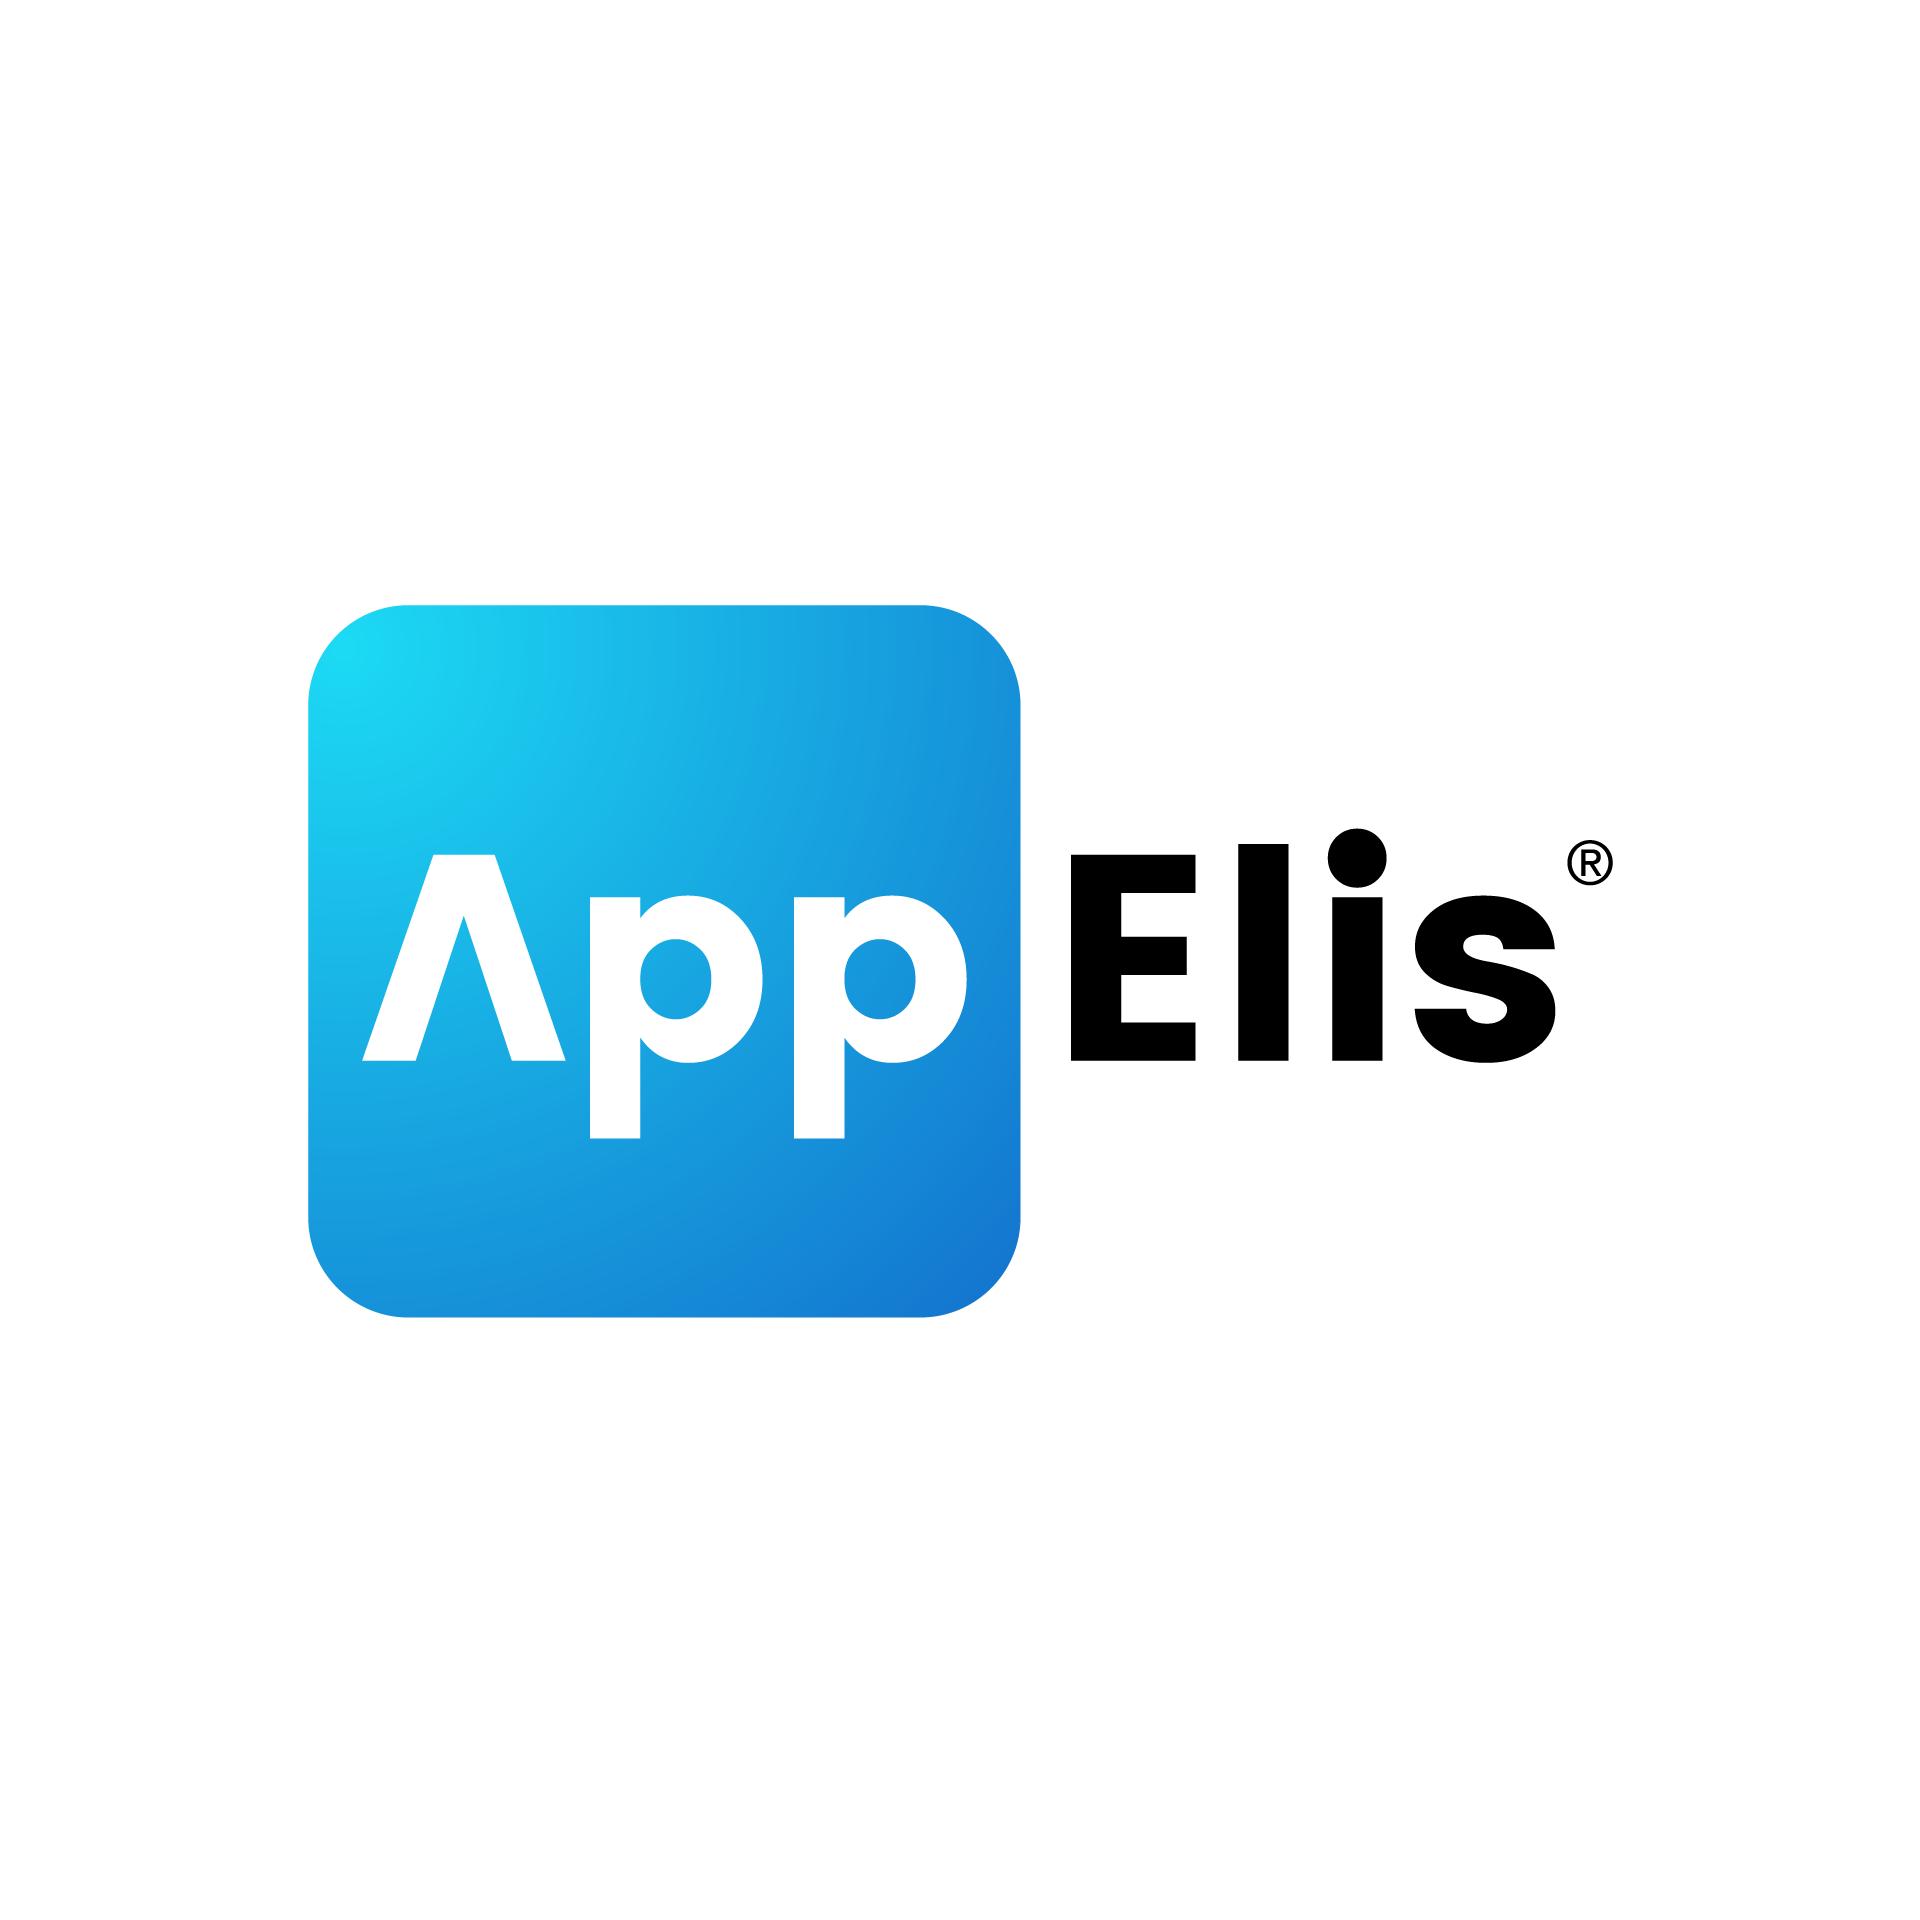 AppElis Logo